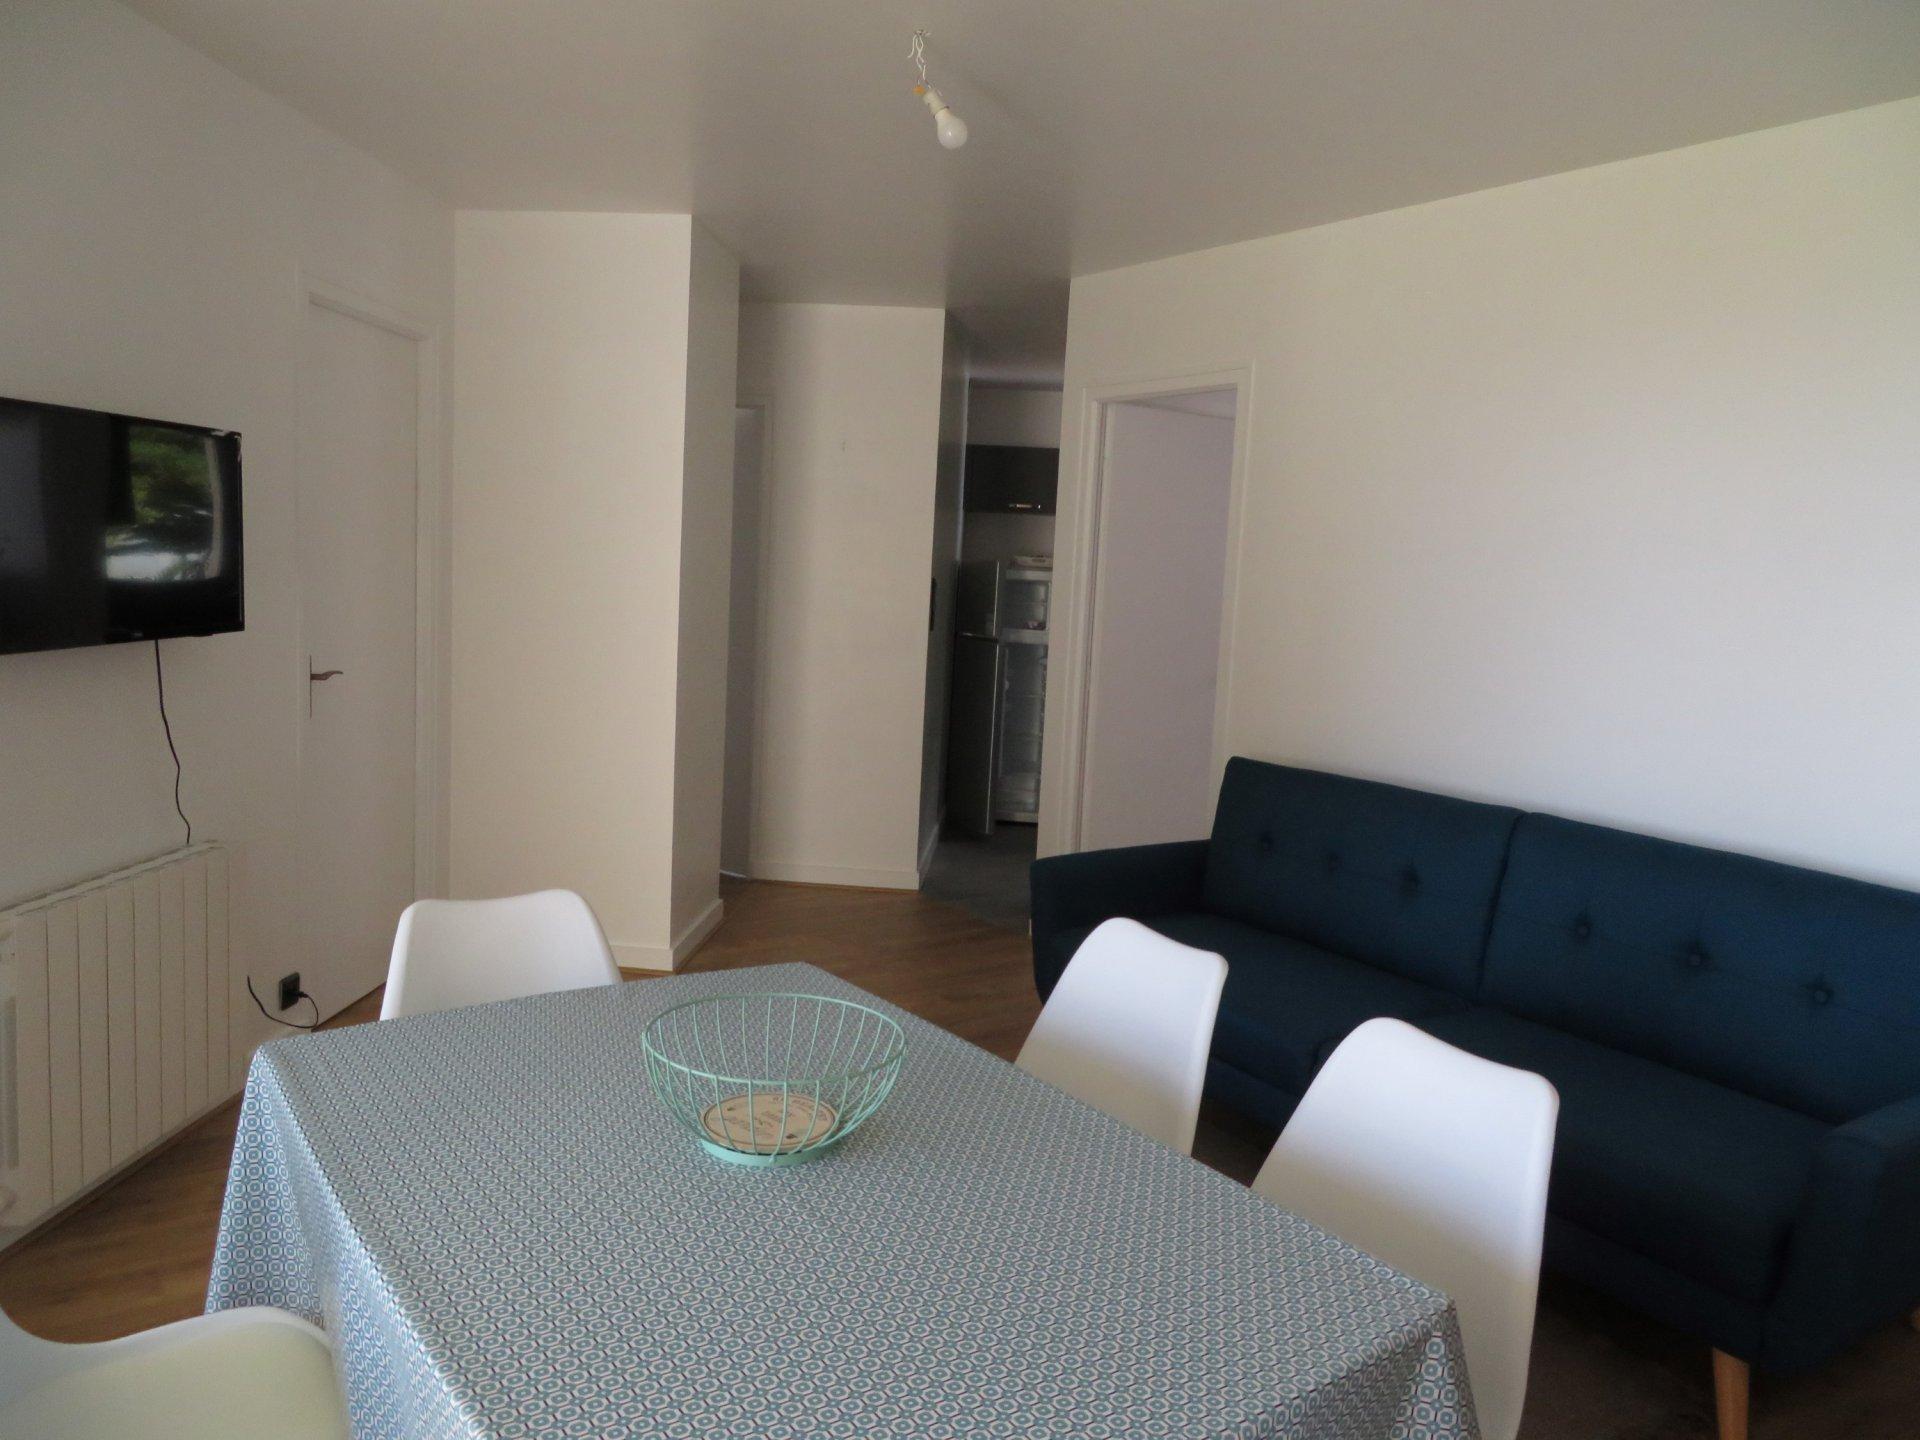 Appartement à louer à Damgan Appartement T4 avec vue mer